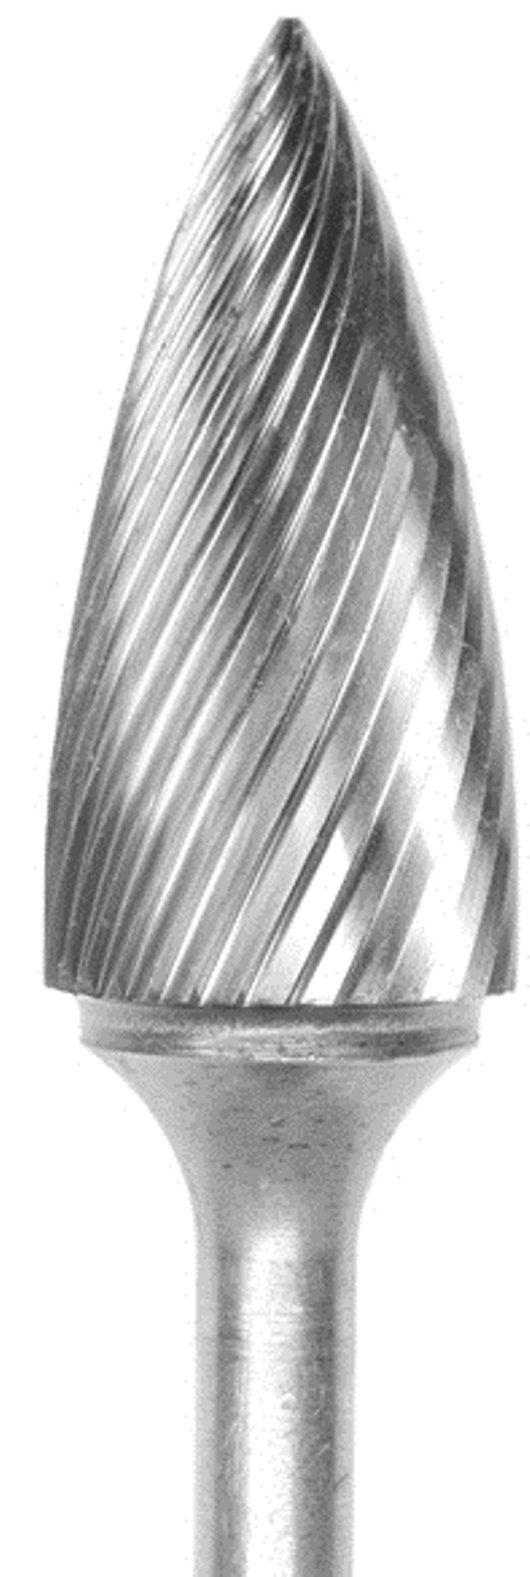 Carbide Bur Grobet U.S.A Made Tree Pointed 3/4x1-1/2x1/4 Standard Cut